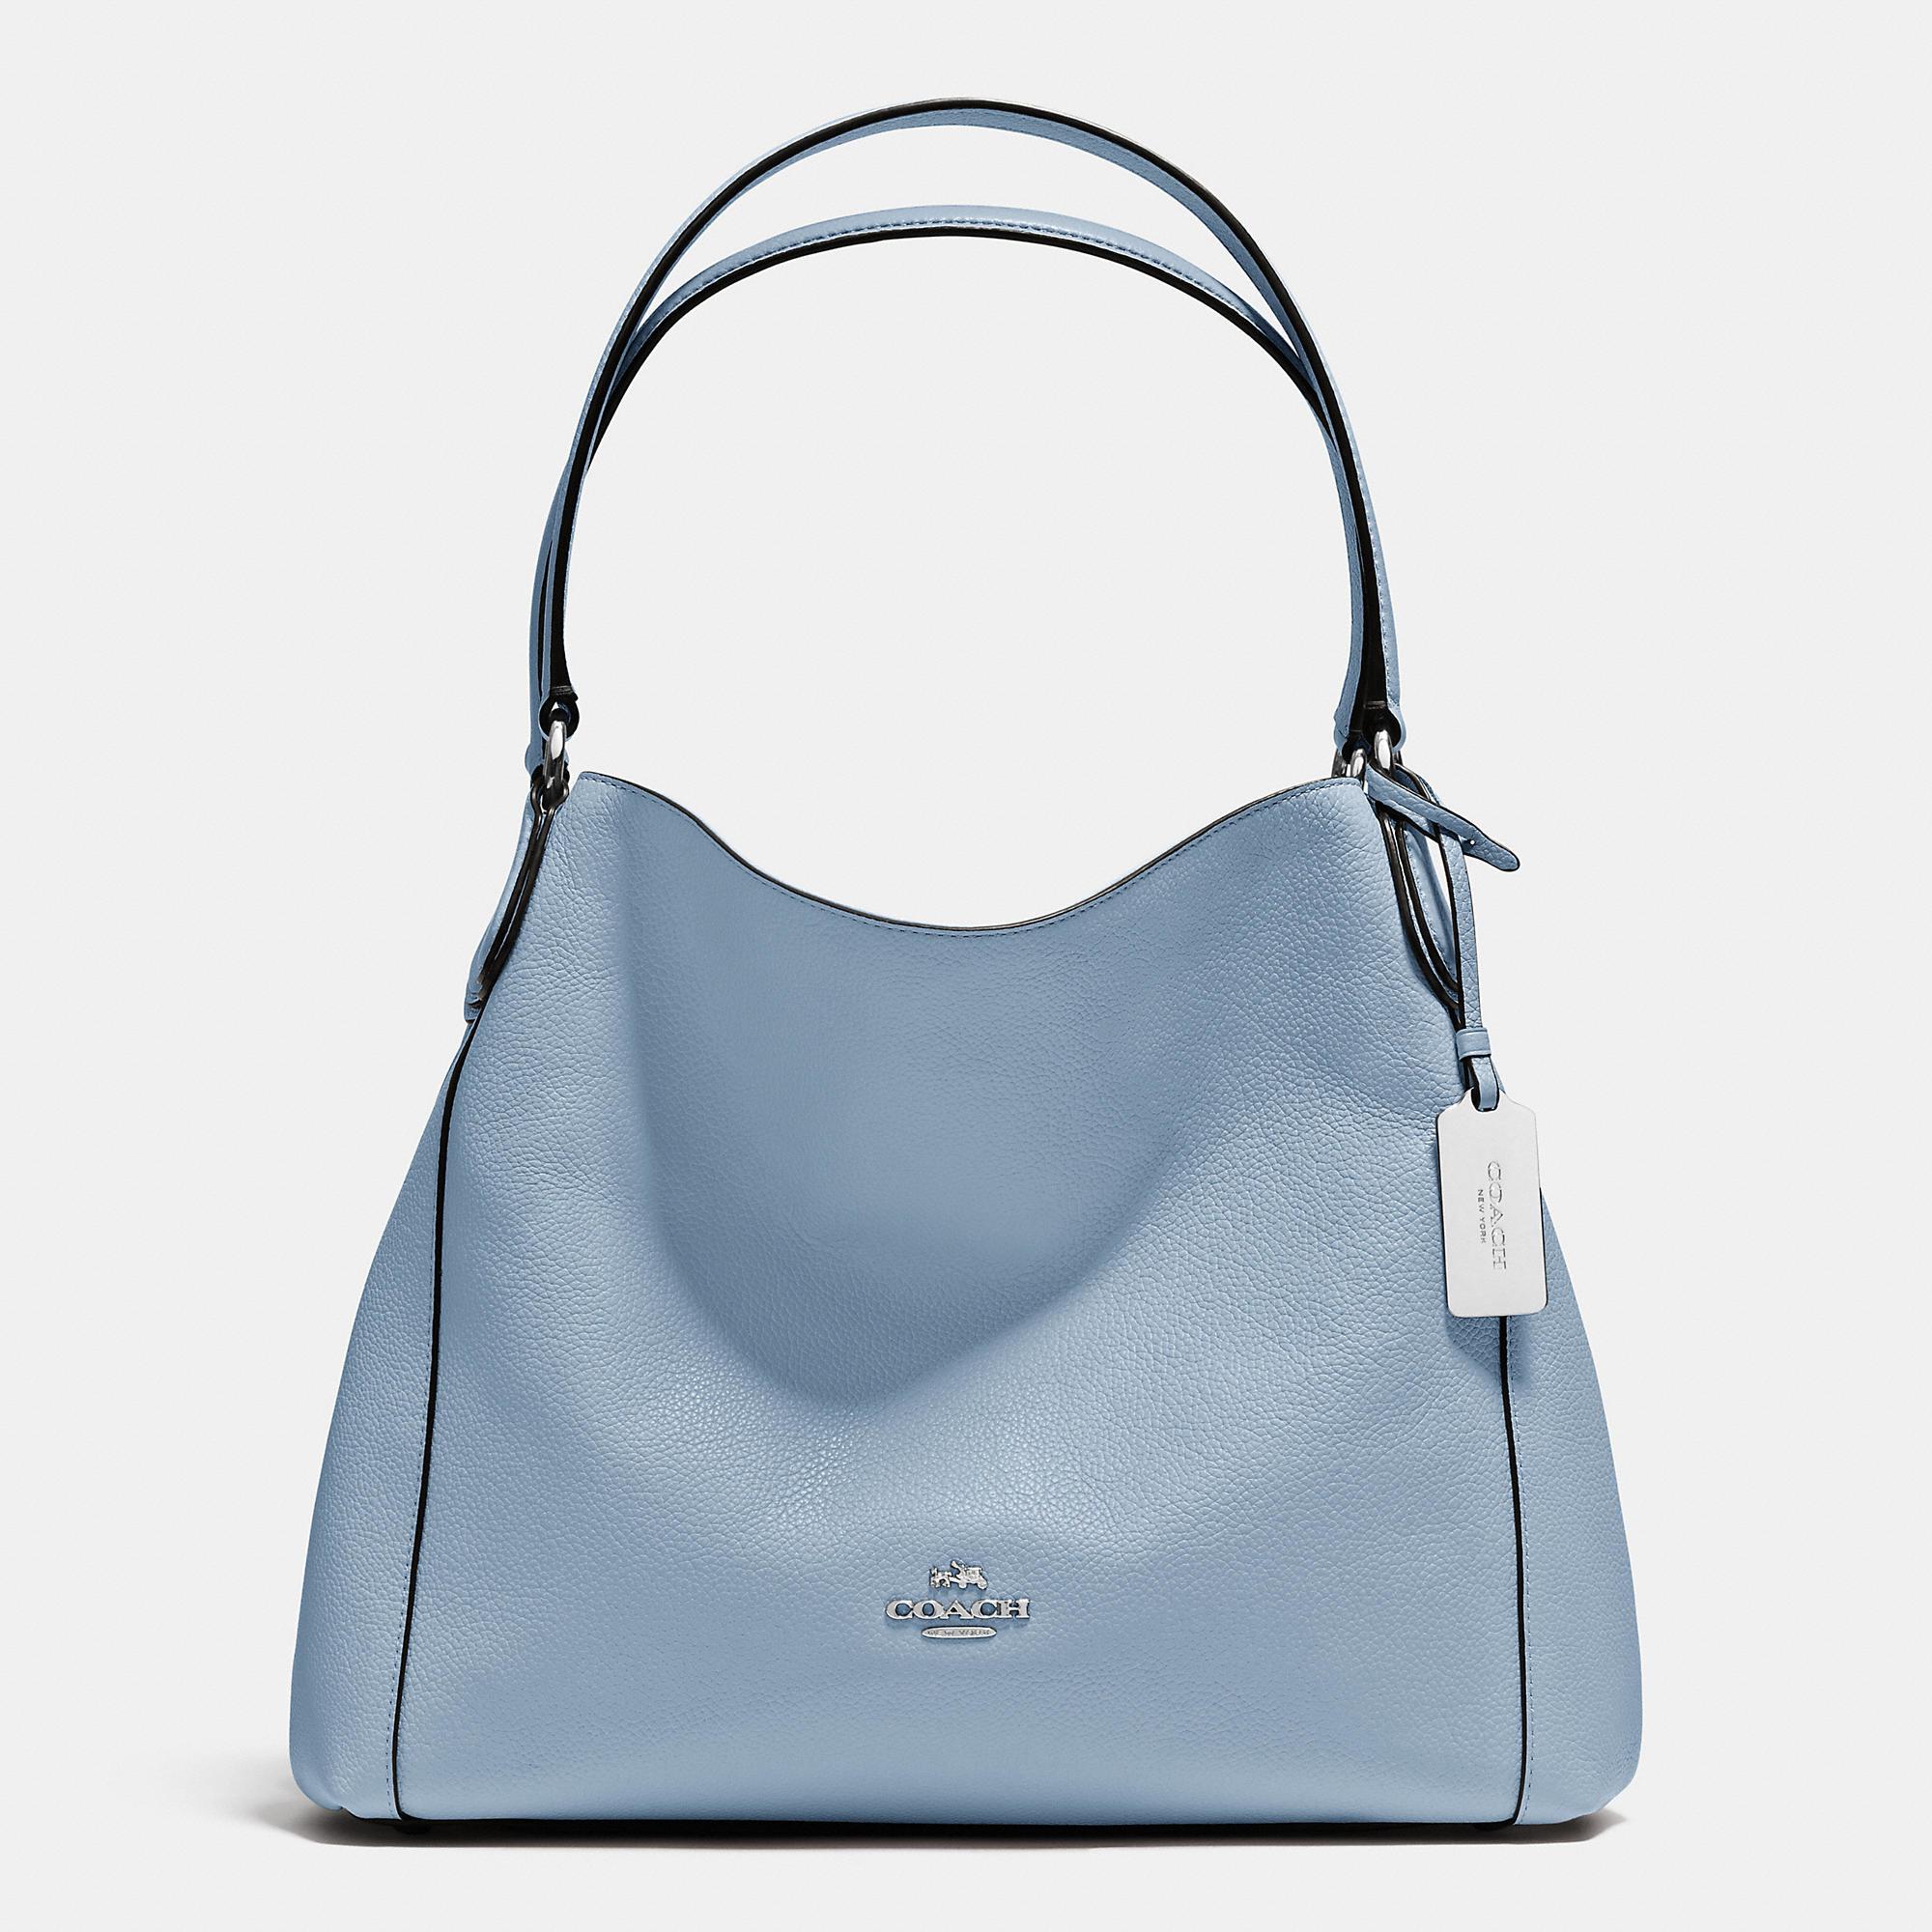 dda74e9487 COACH Edie Shoulder Bag 31 In Refined Pebble Leather in Blue - Lyst